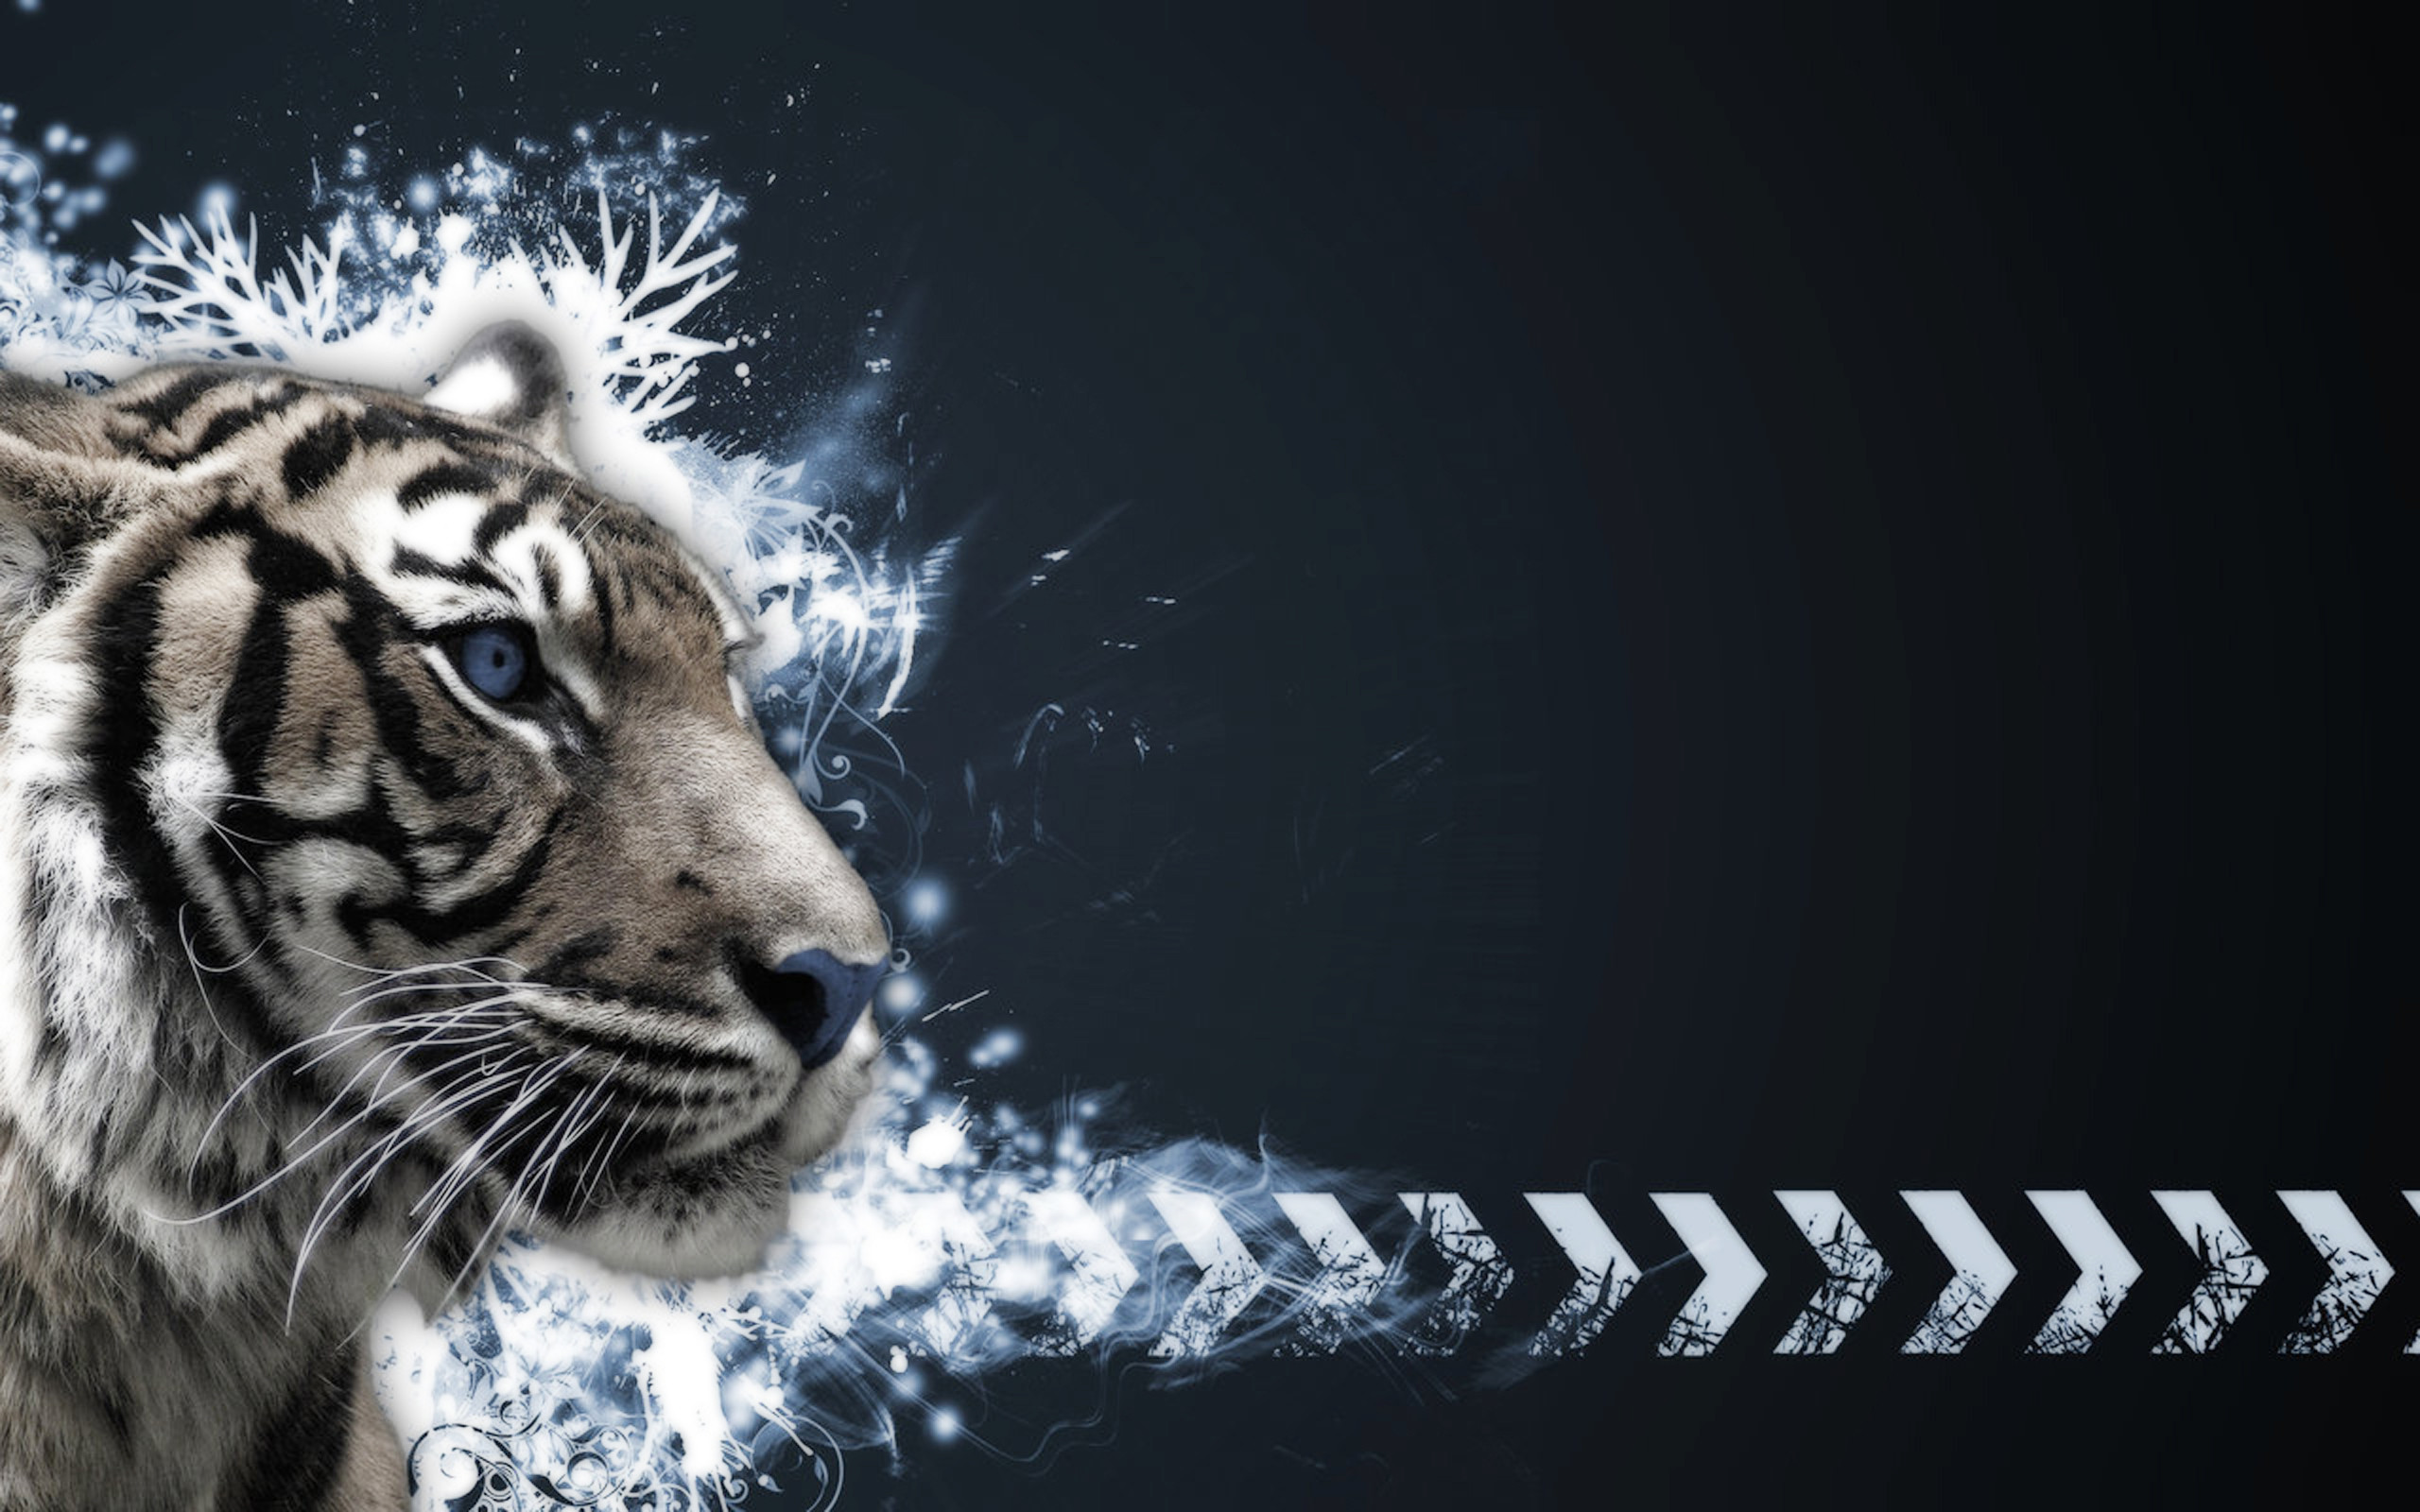 Animal Tiger Wallpaper. Animal Tiger